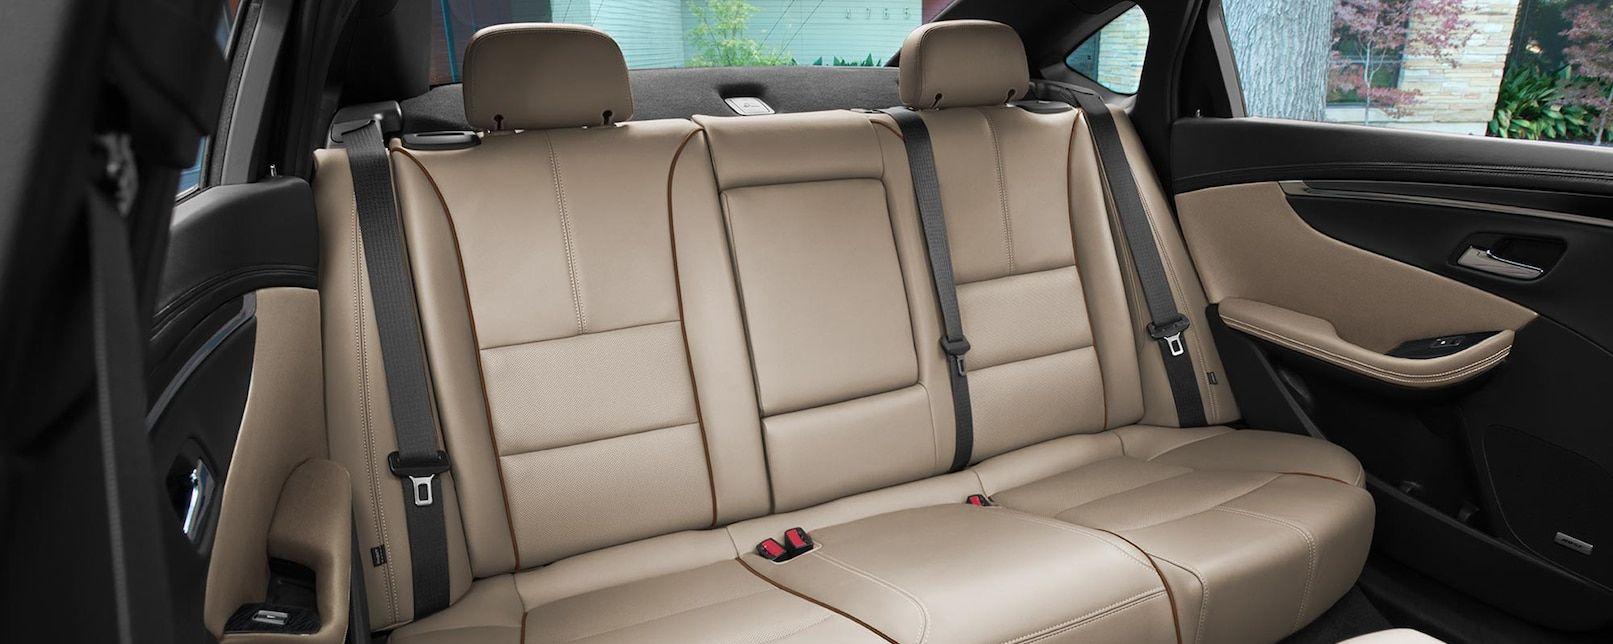 Cozy Rear Seats in the Chevrolet Impala